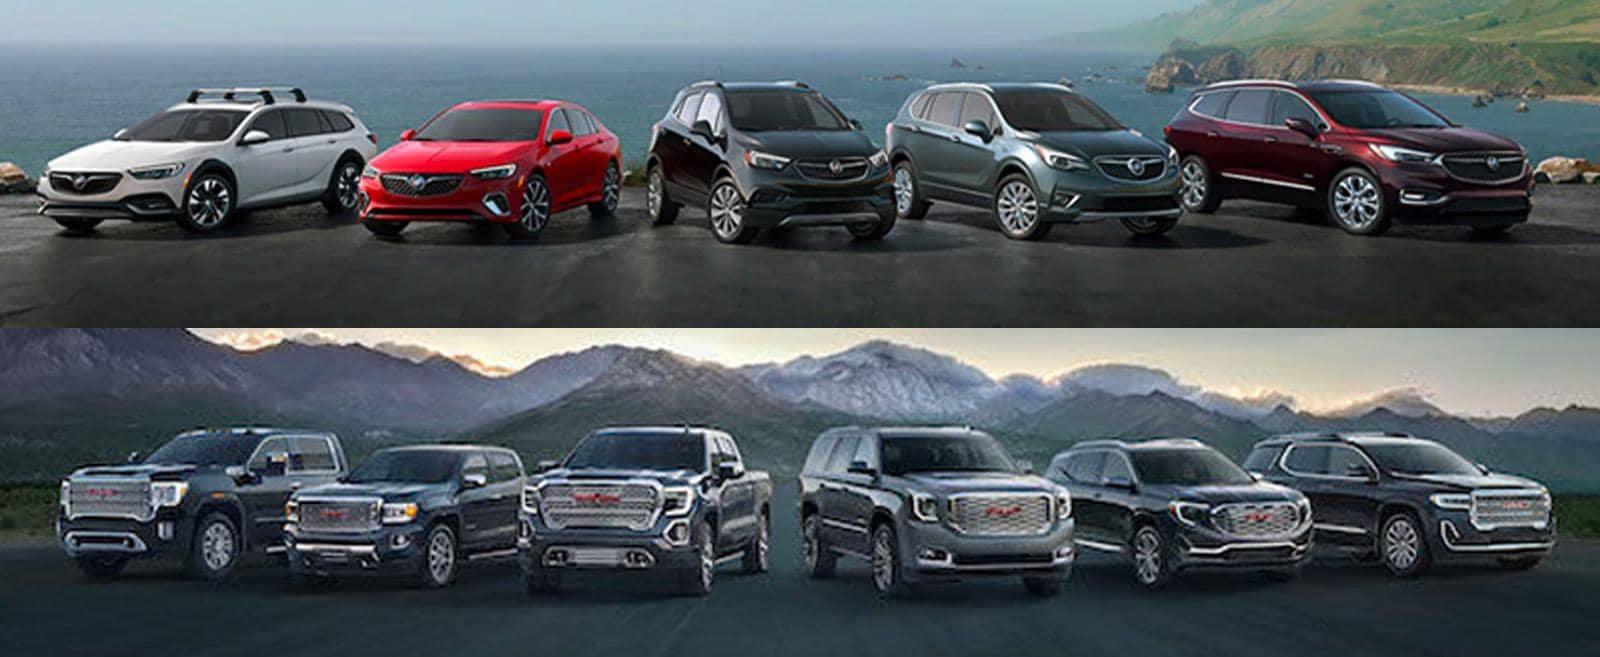 Buick GMC Vehicle Selection